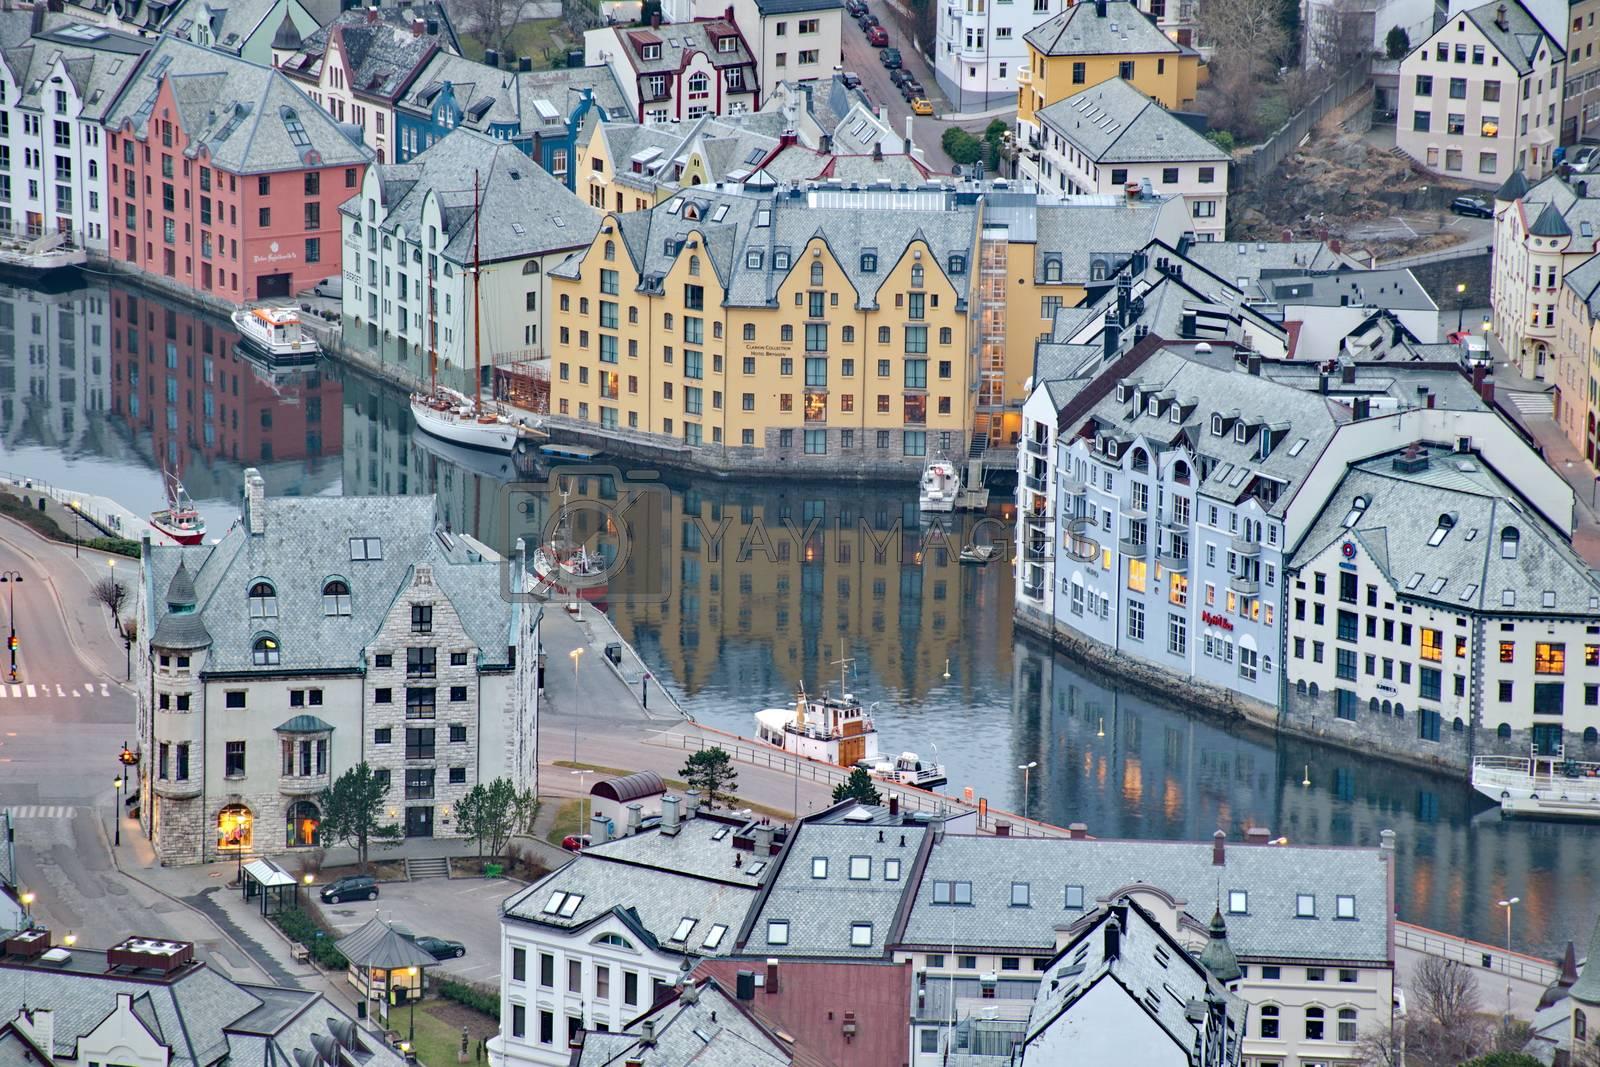 City of Alesund in Norway